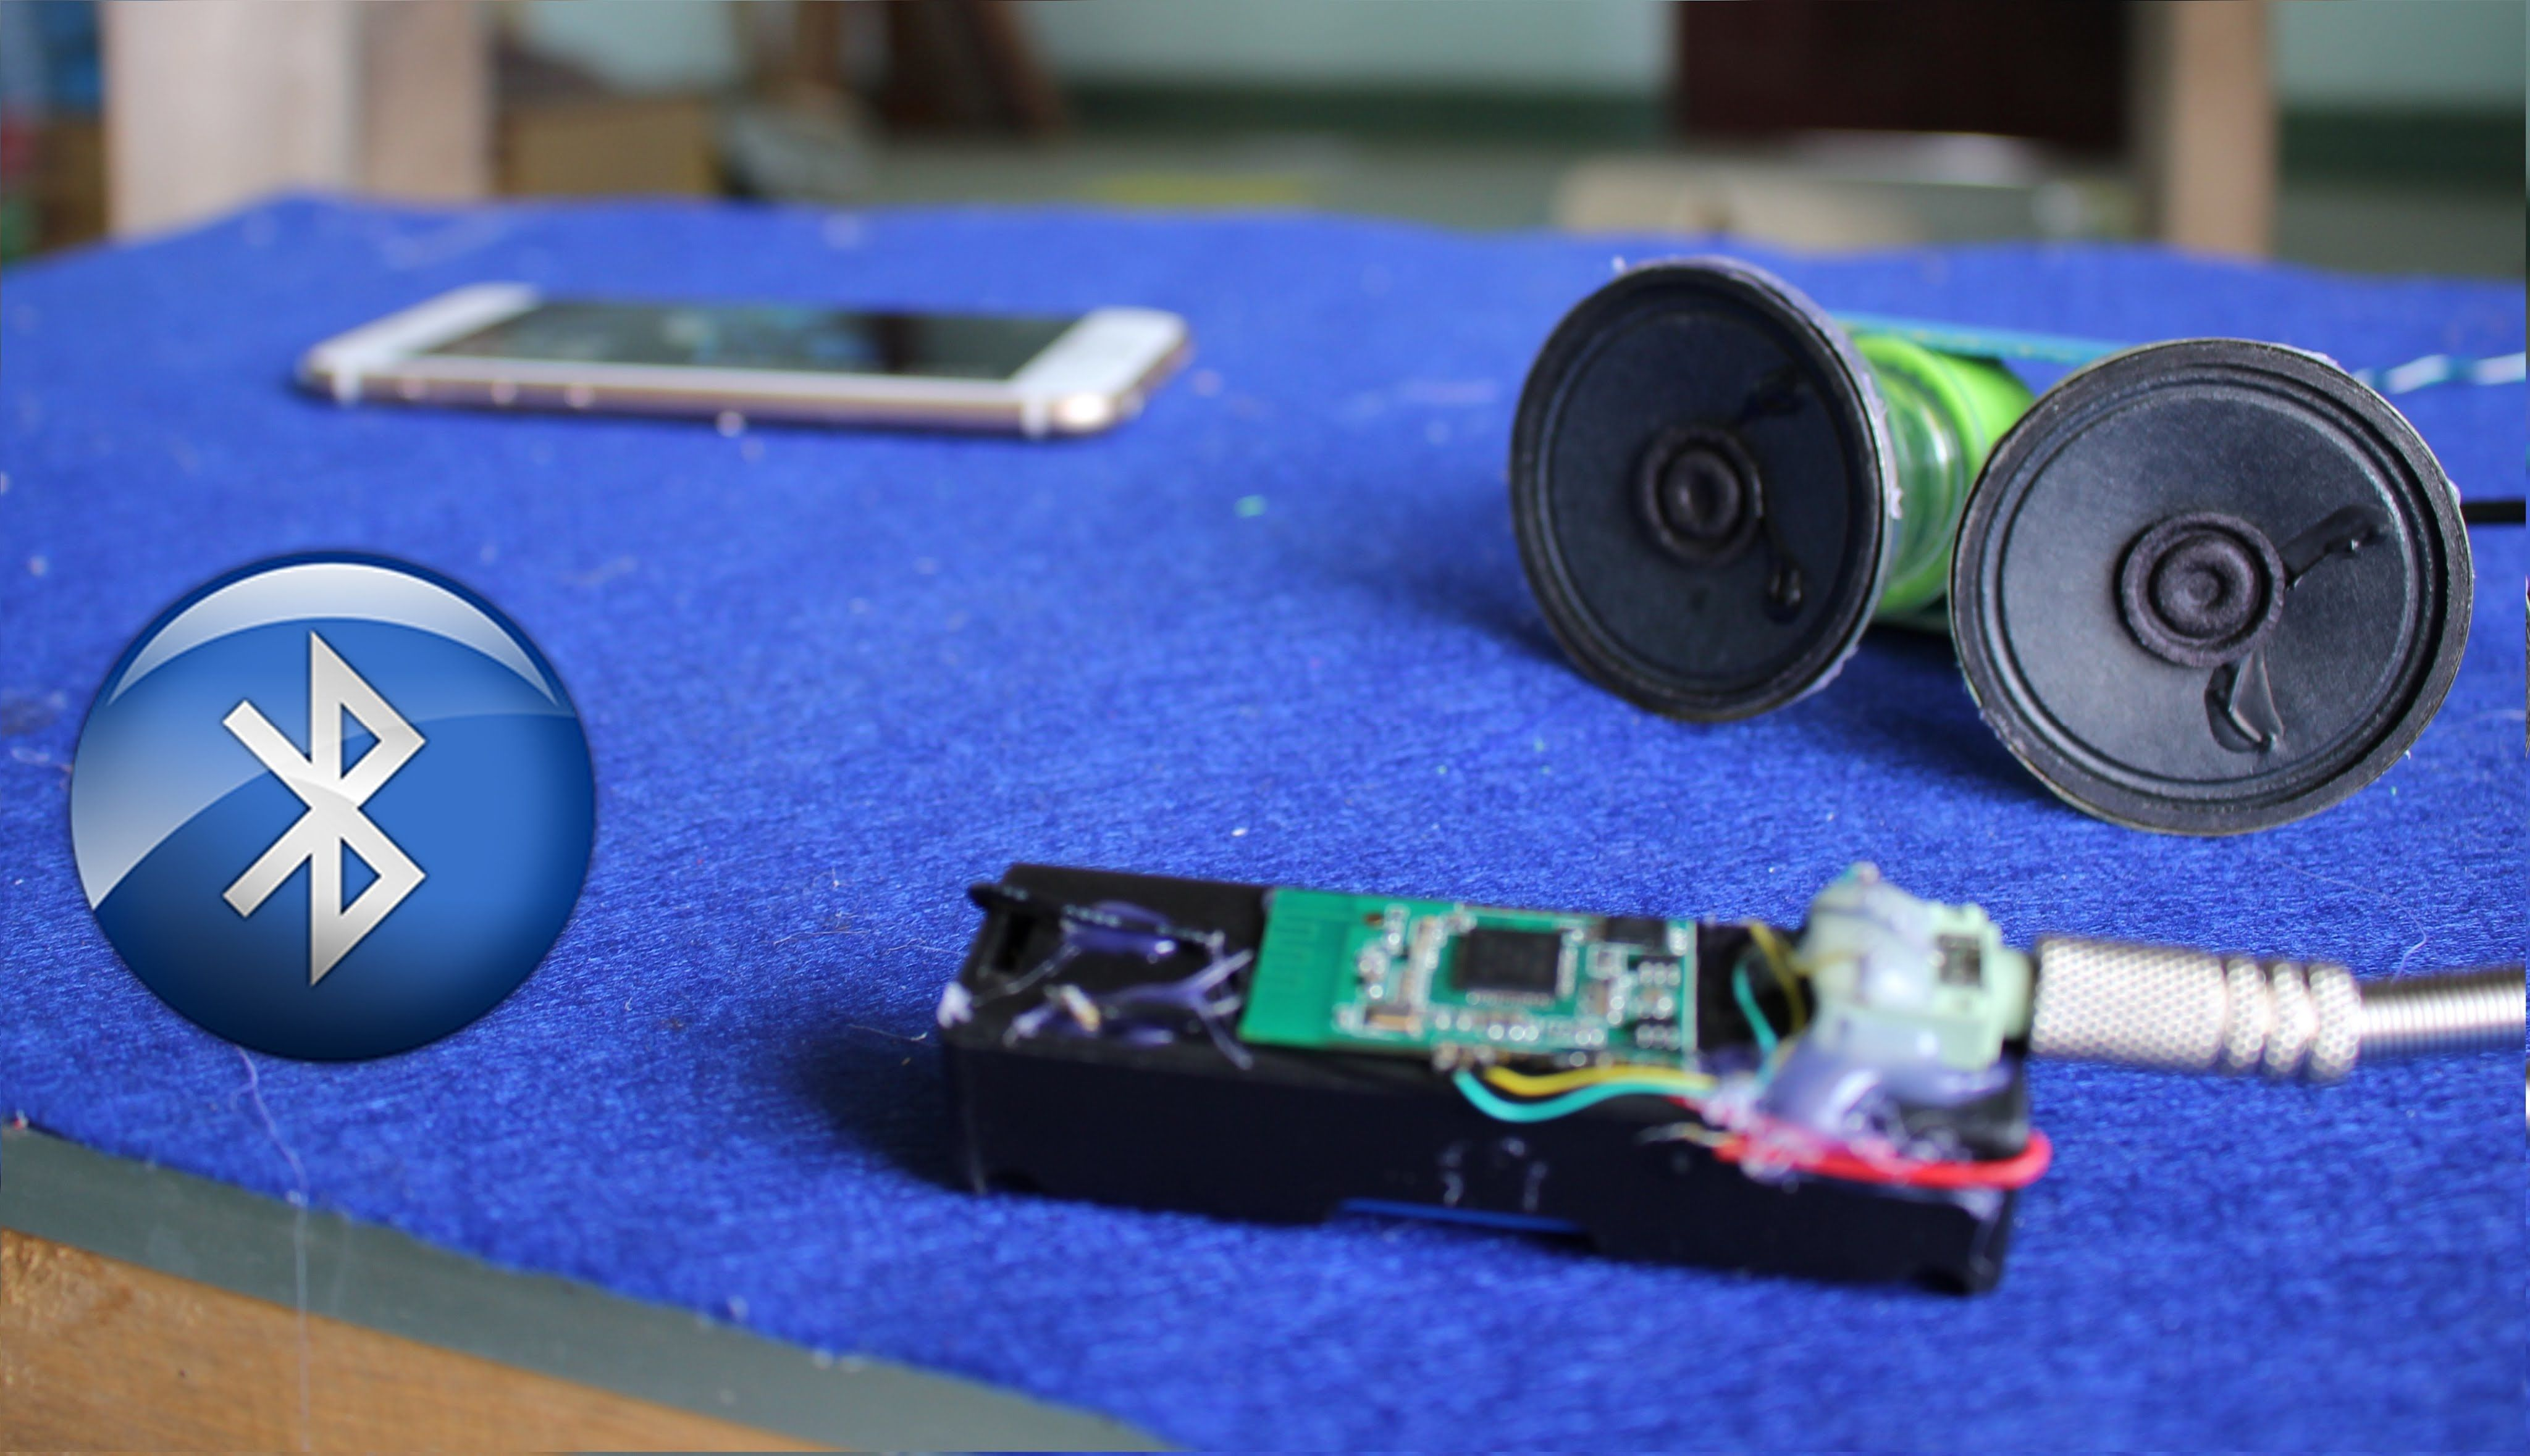 Canción Https Www Youtube Com Watch V Bm7sz5sbzyy Componentes Módulo Electrónica Bluetooth Altavoces Caseros